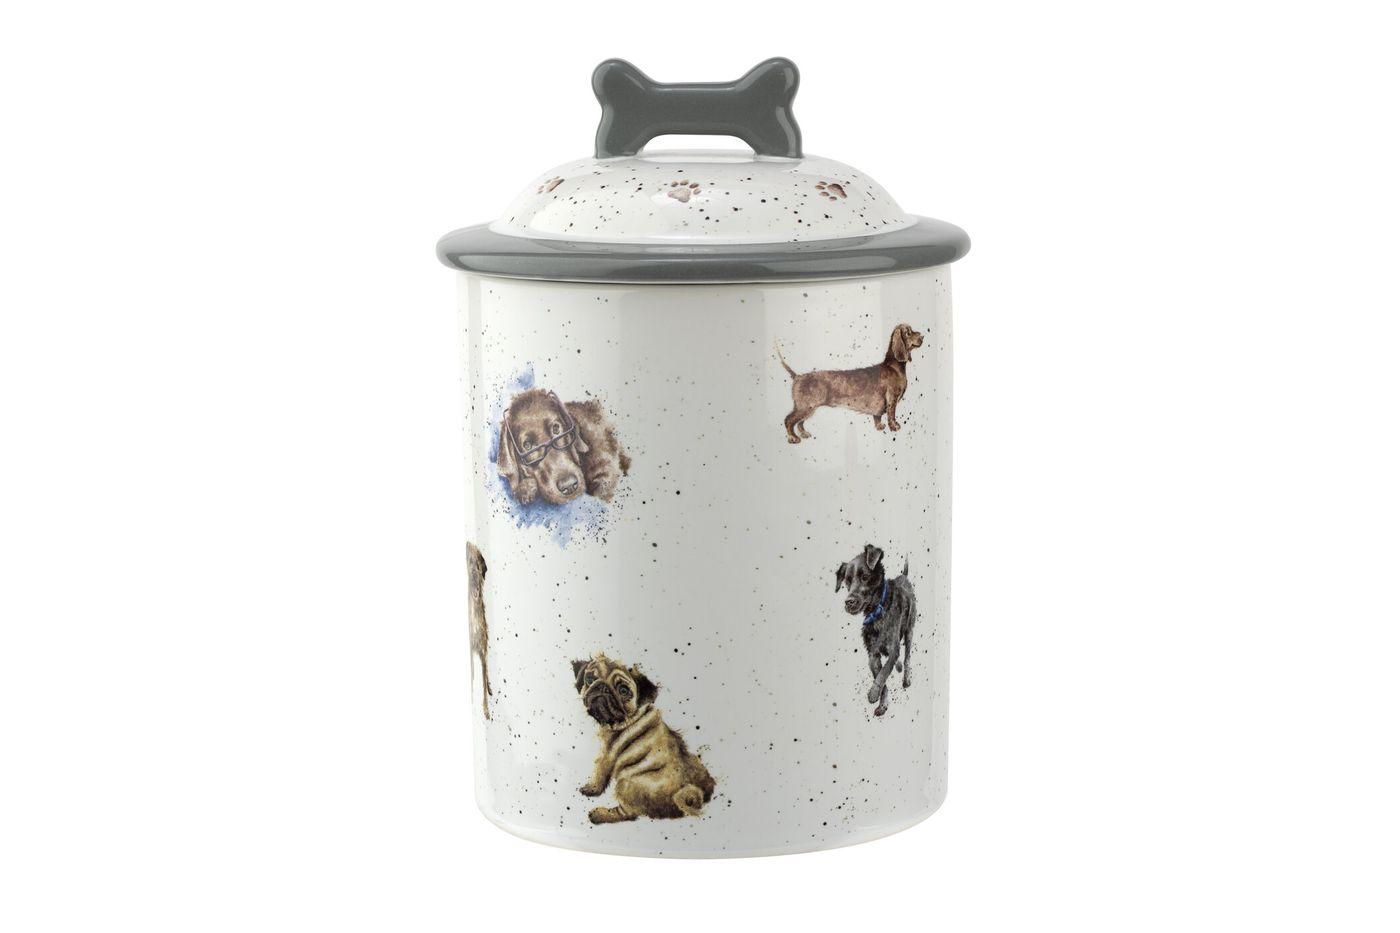 Royal Worcester Wrendale Designs Dog Treat Jar 19cm thumb 1